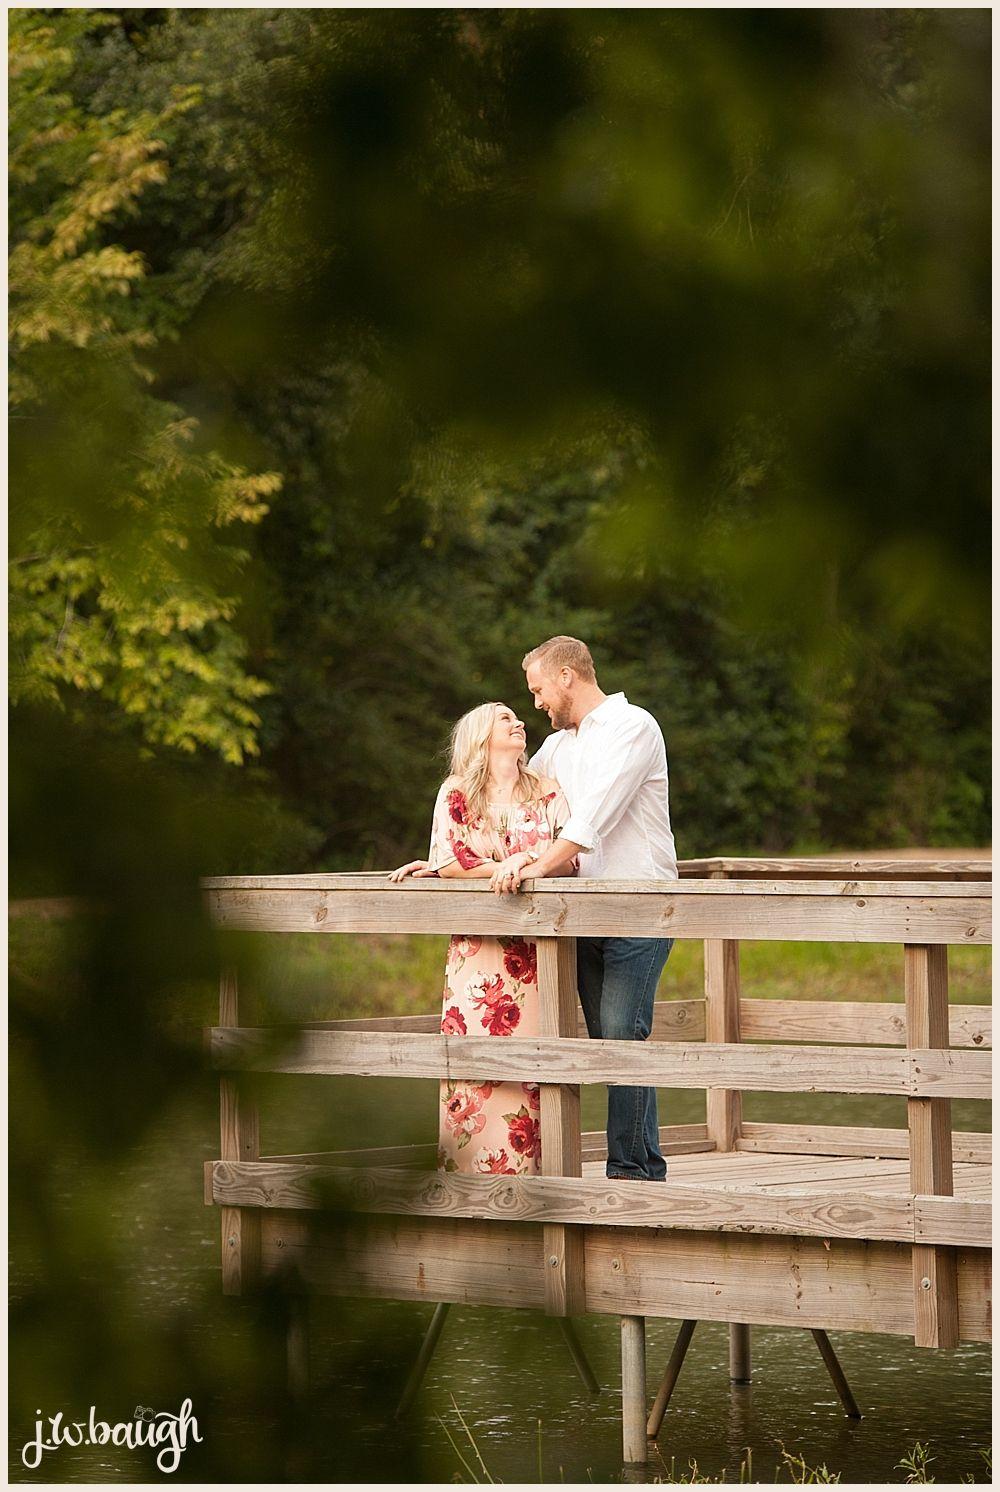 Lake engagement session, candid engagement photo, engagement portraits, floral dress, The Woodlands Engagement Session